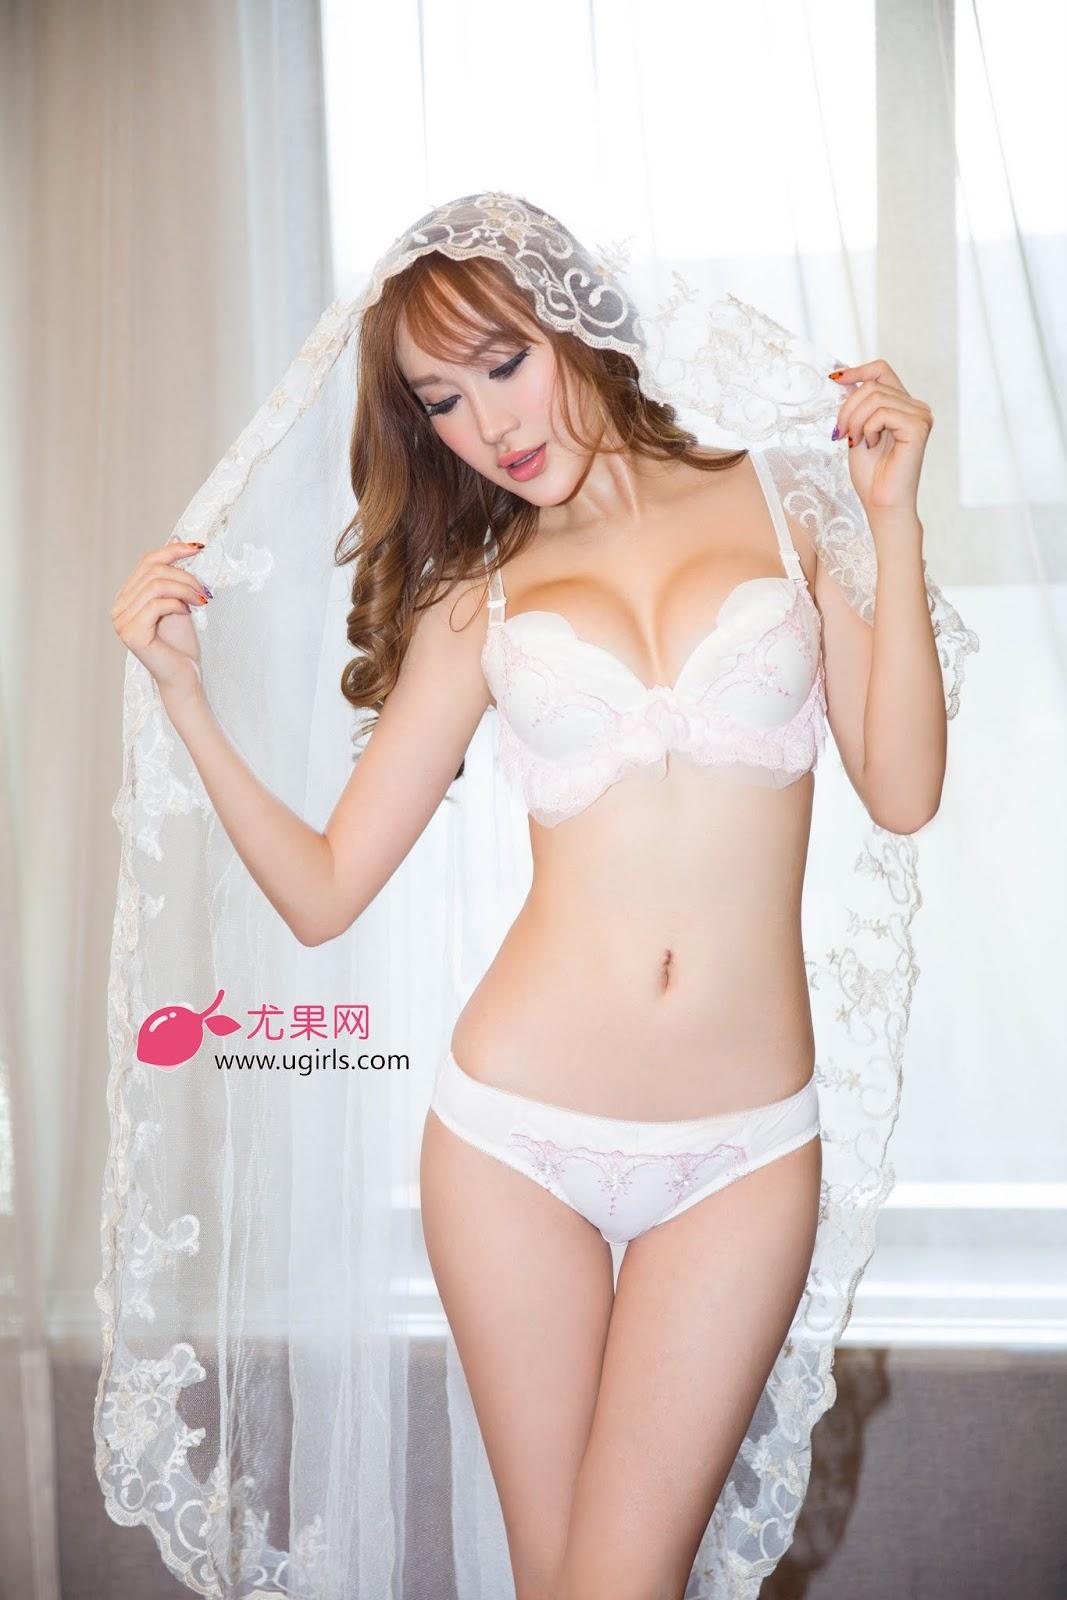 A14A4310 - Hot Photo UGIRLS NO.3 Nude Girl